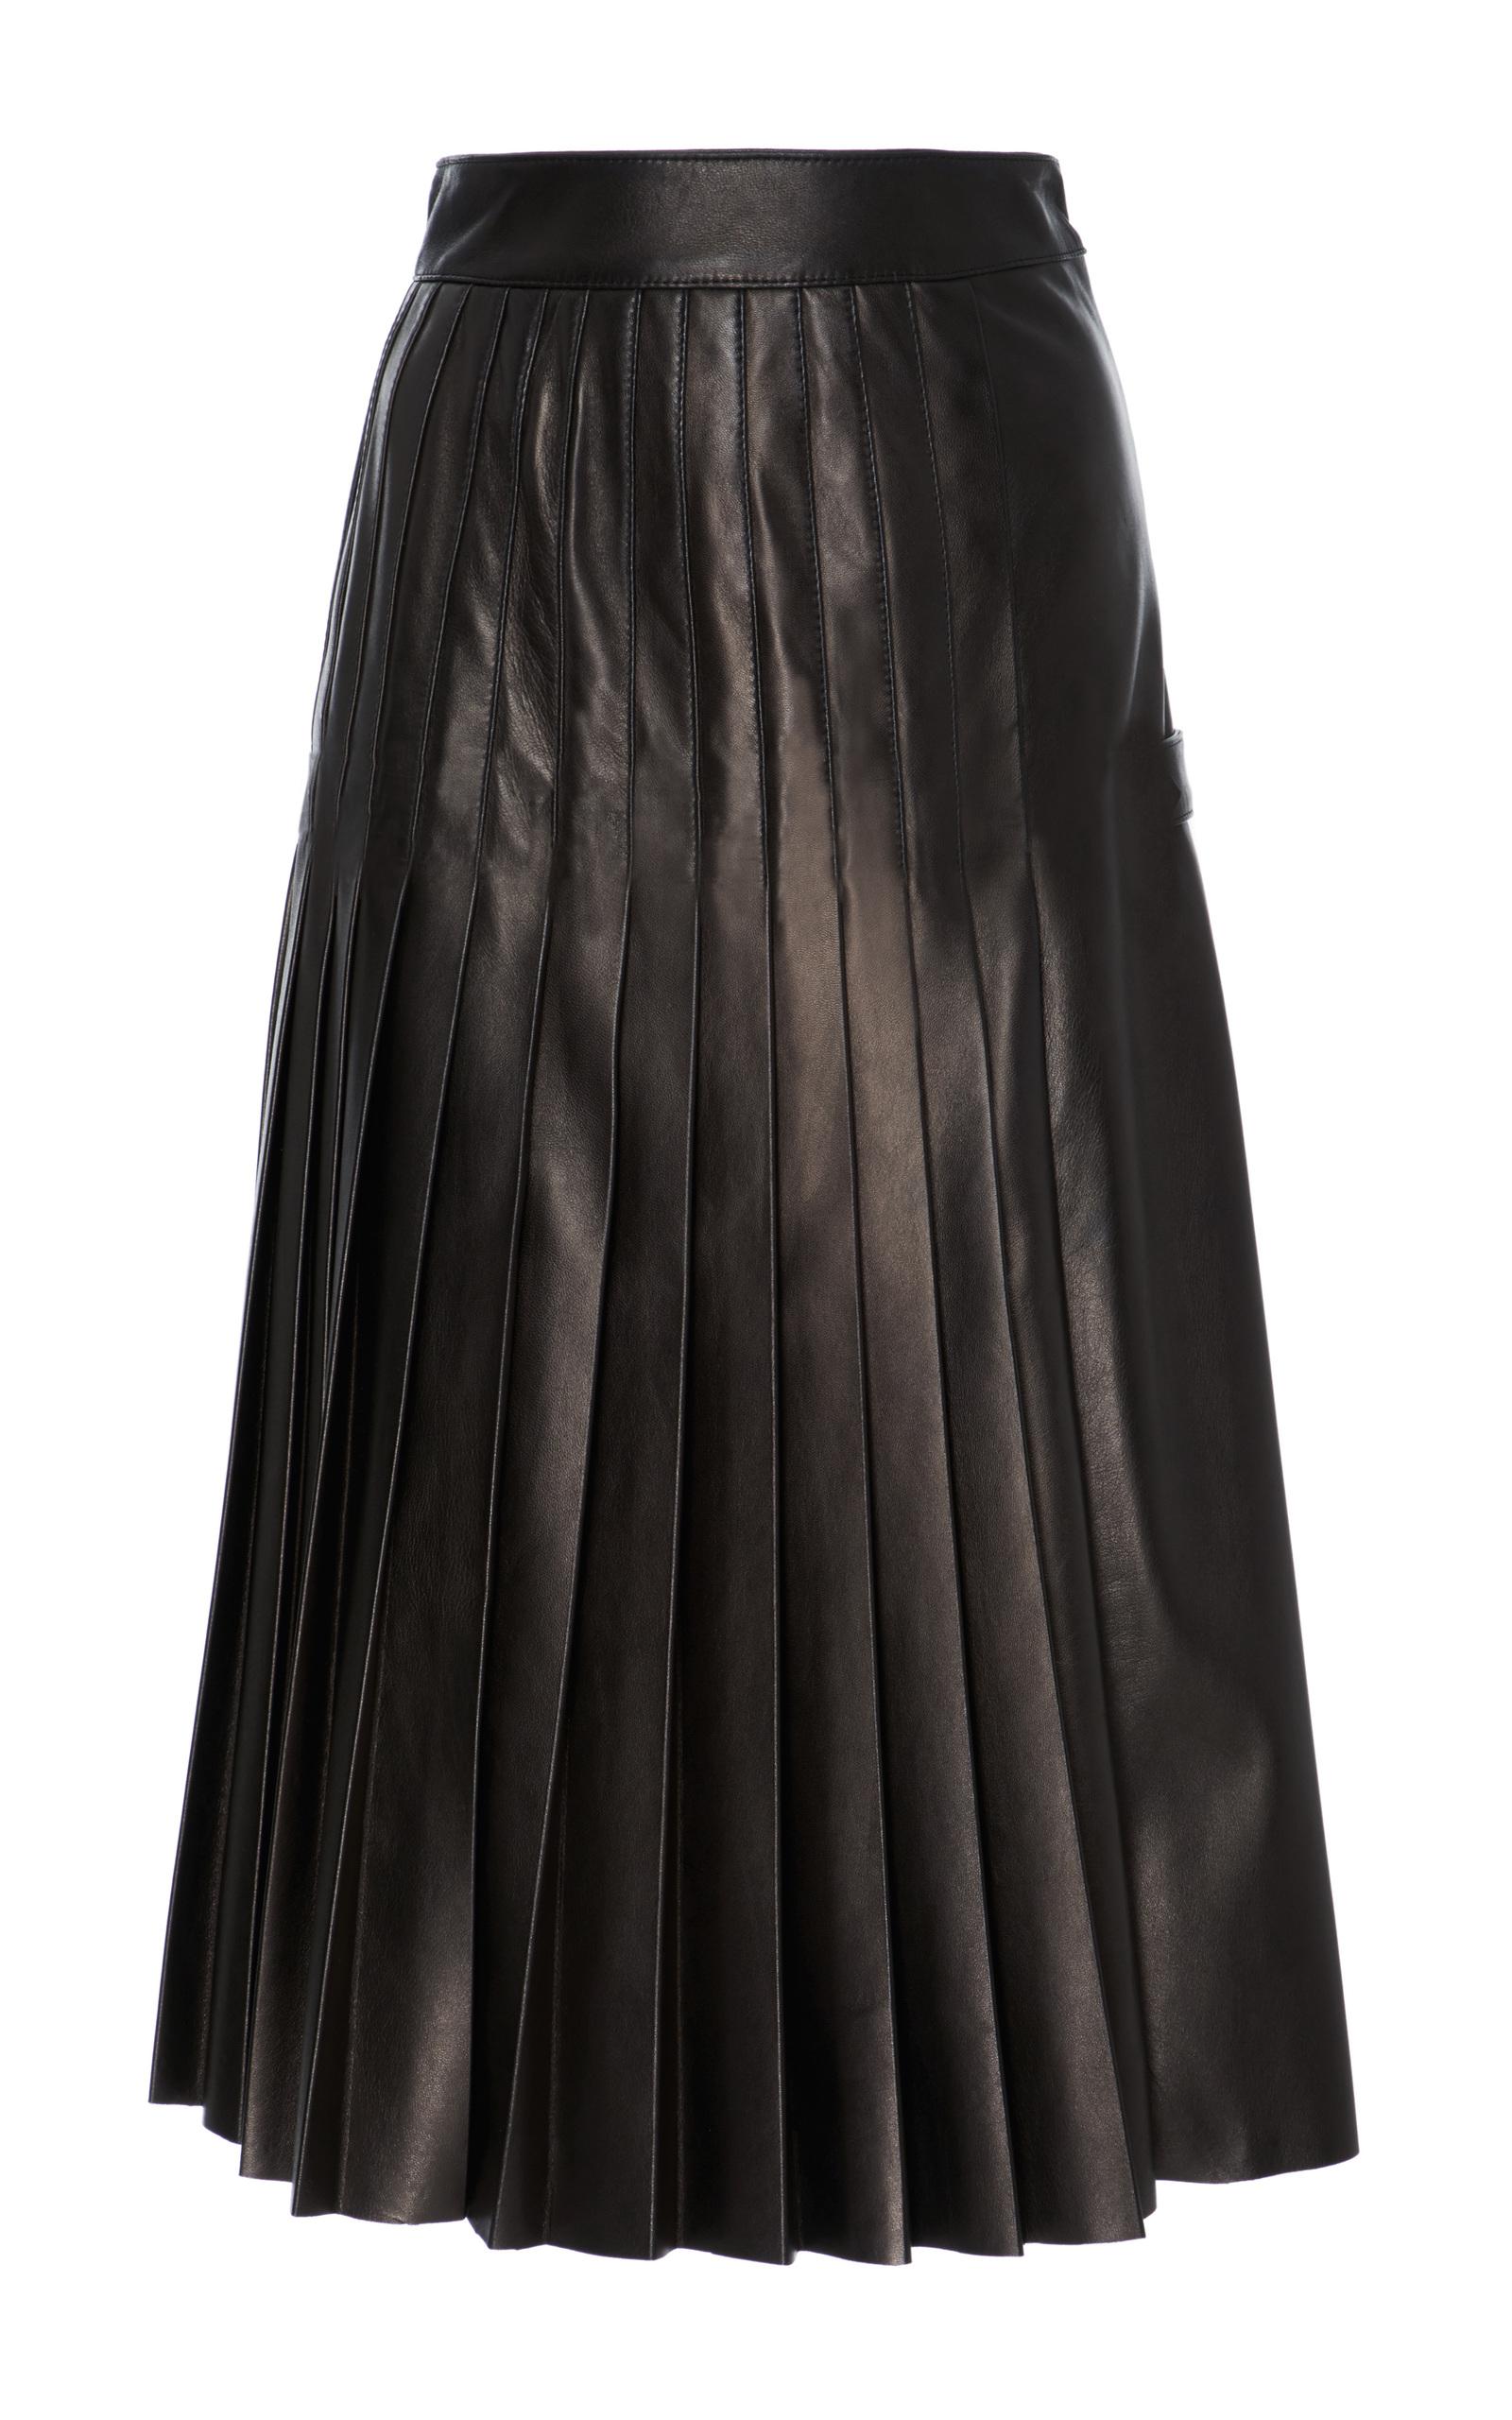 588db4022f Black Leather A Line Midi Skirt